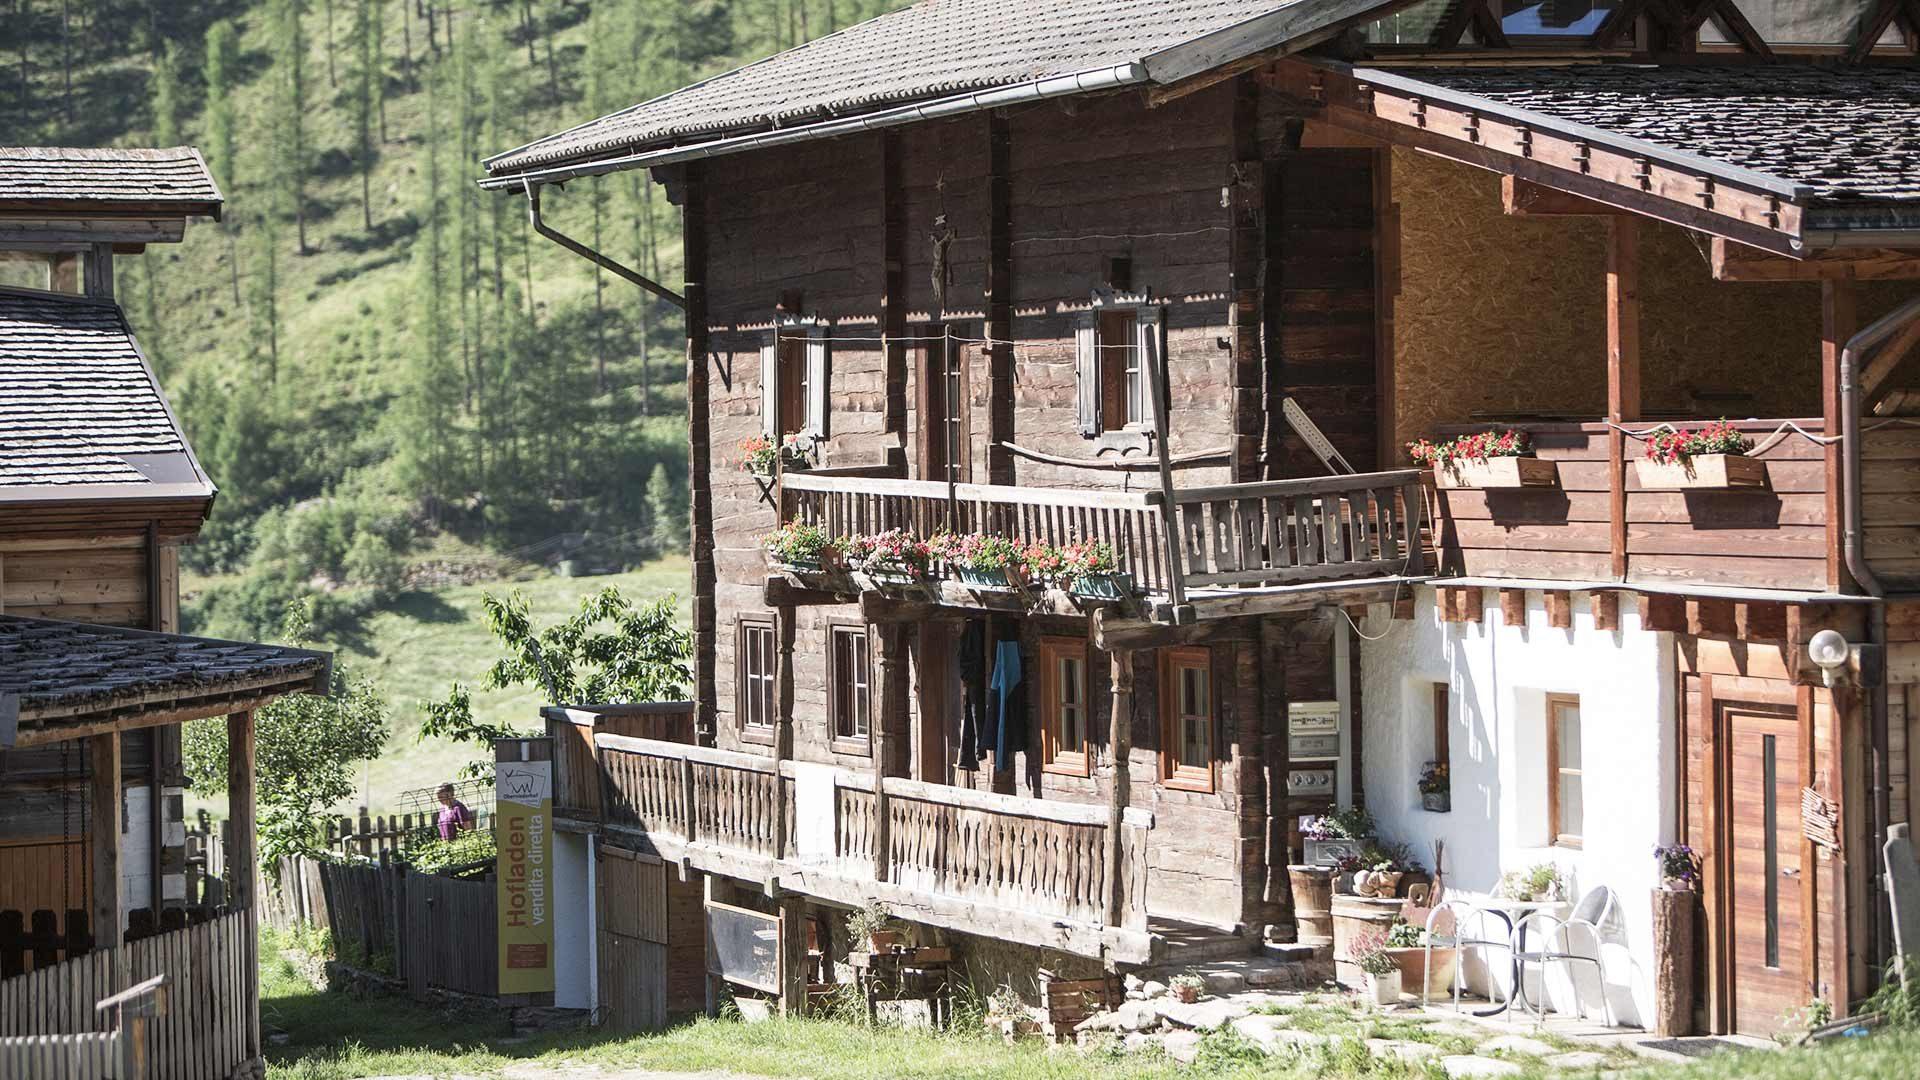 Maso storico e biologico Oberniederhof